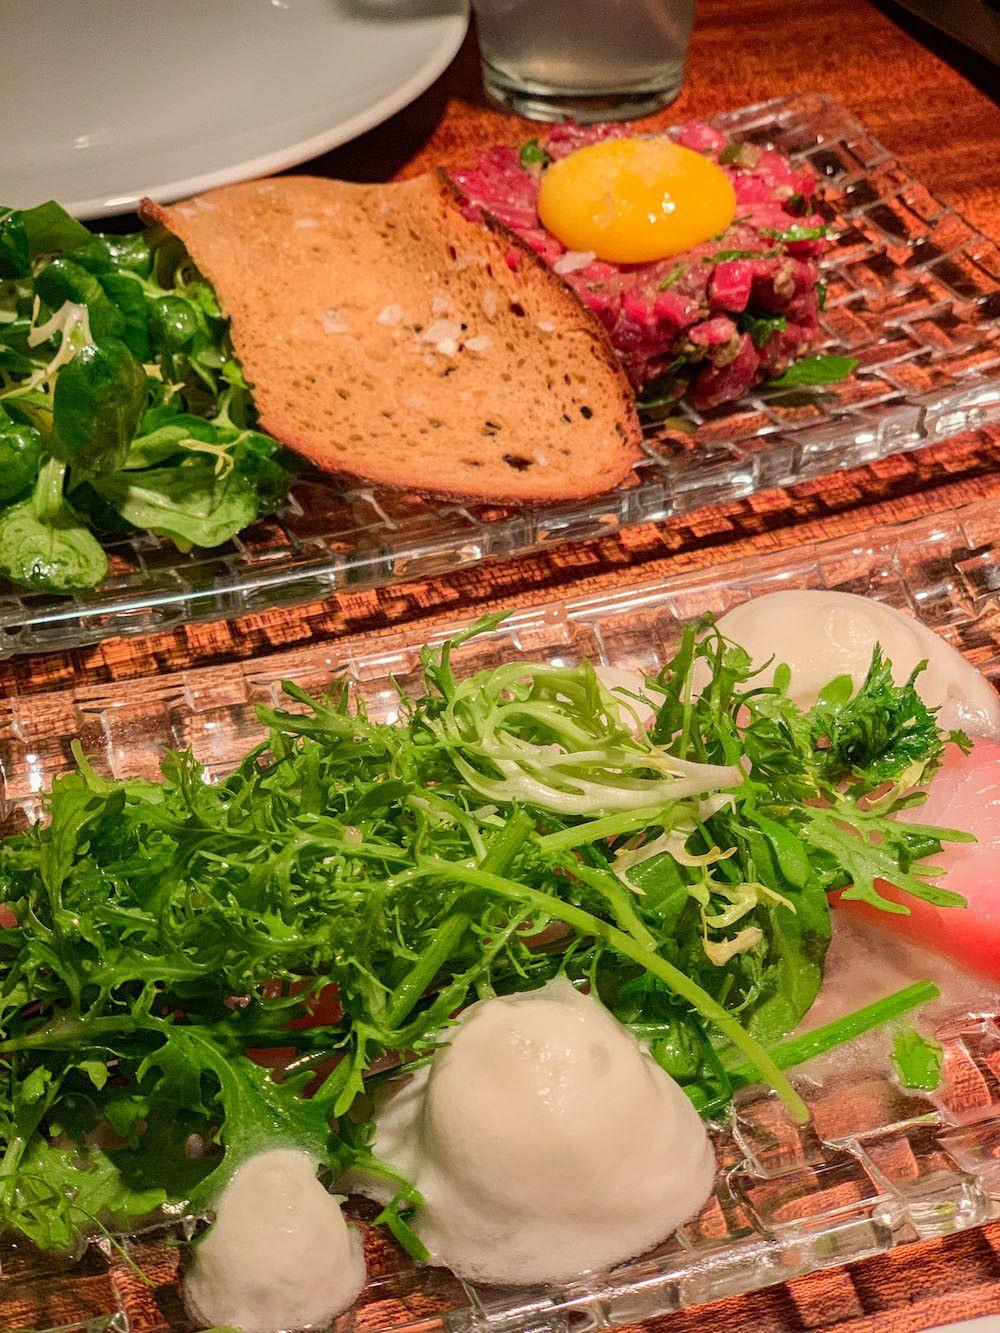 Foodblogog, Leckerbissen, Crackers, Ceviche, King Fish, Meerettich